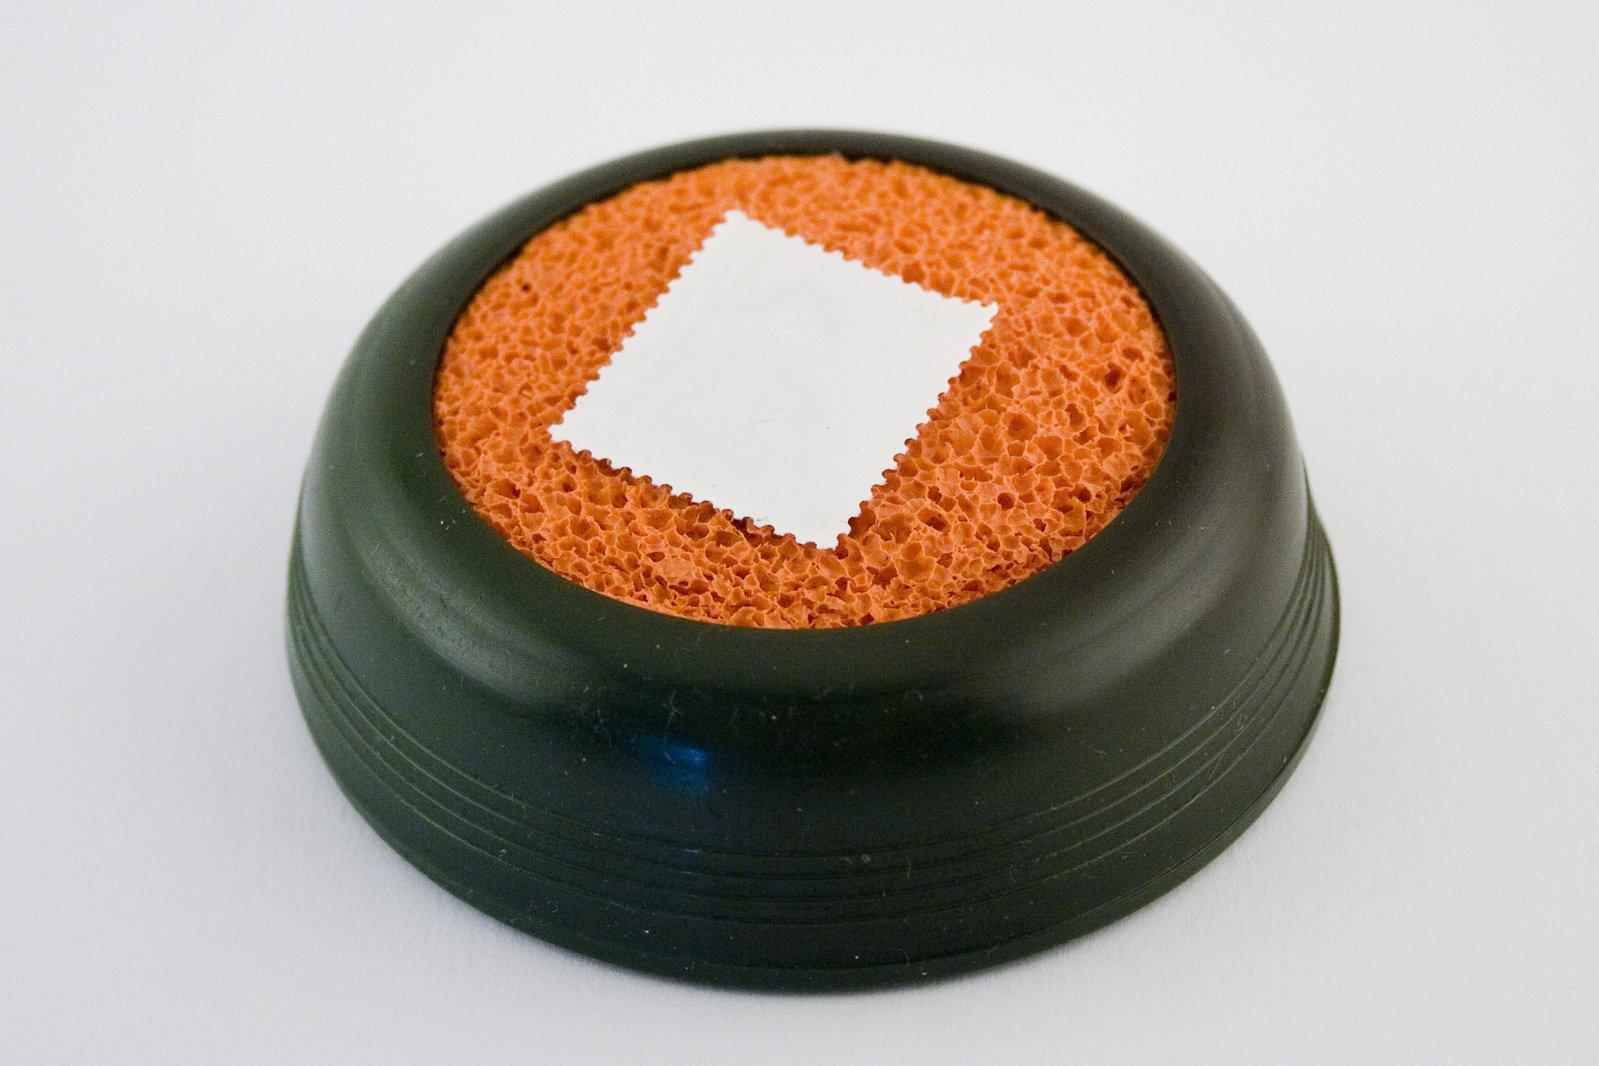 Free Stamp Sponge 3 Stock Photo